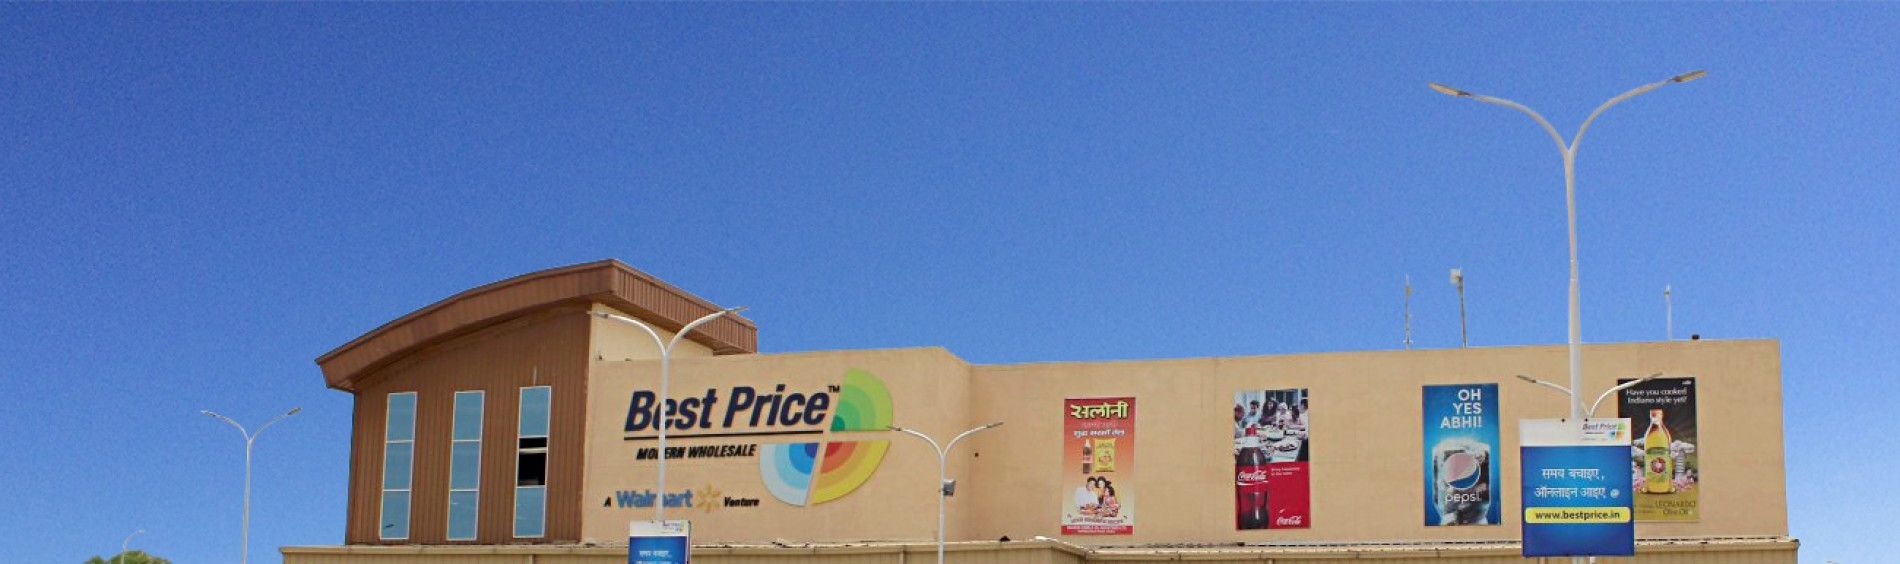 Best Price exterior